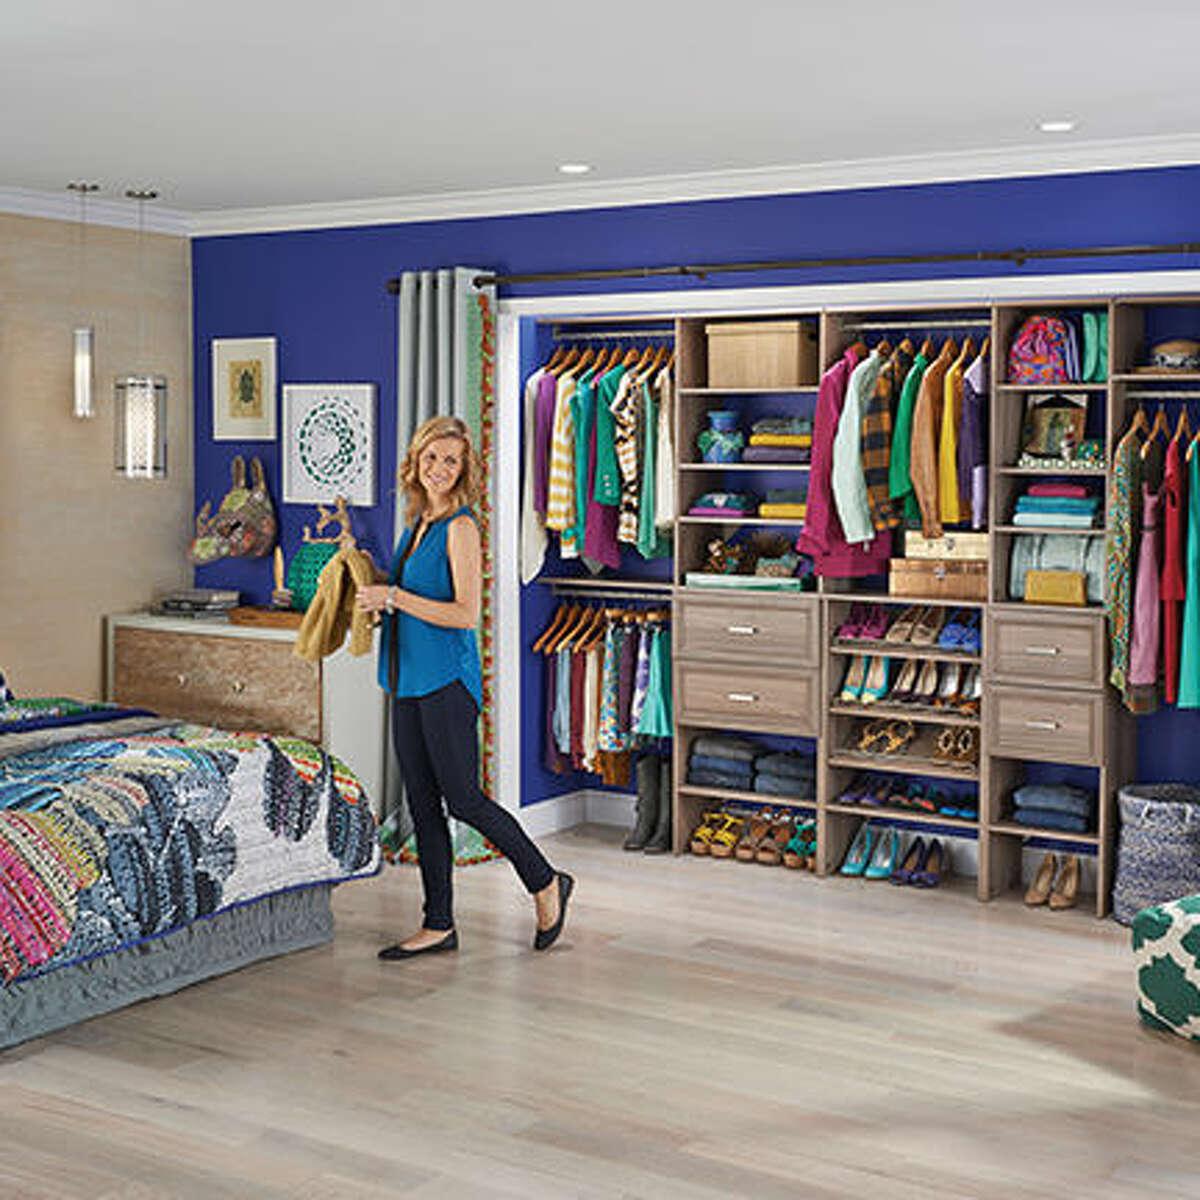 Shop Your Way to an Organized Closet